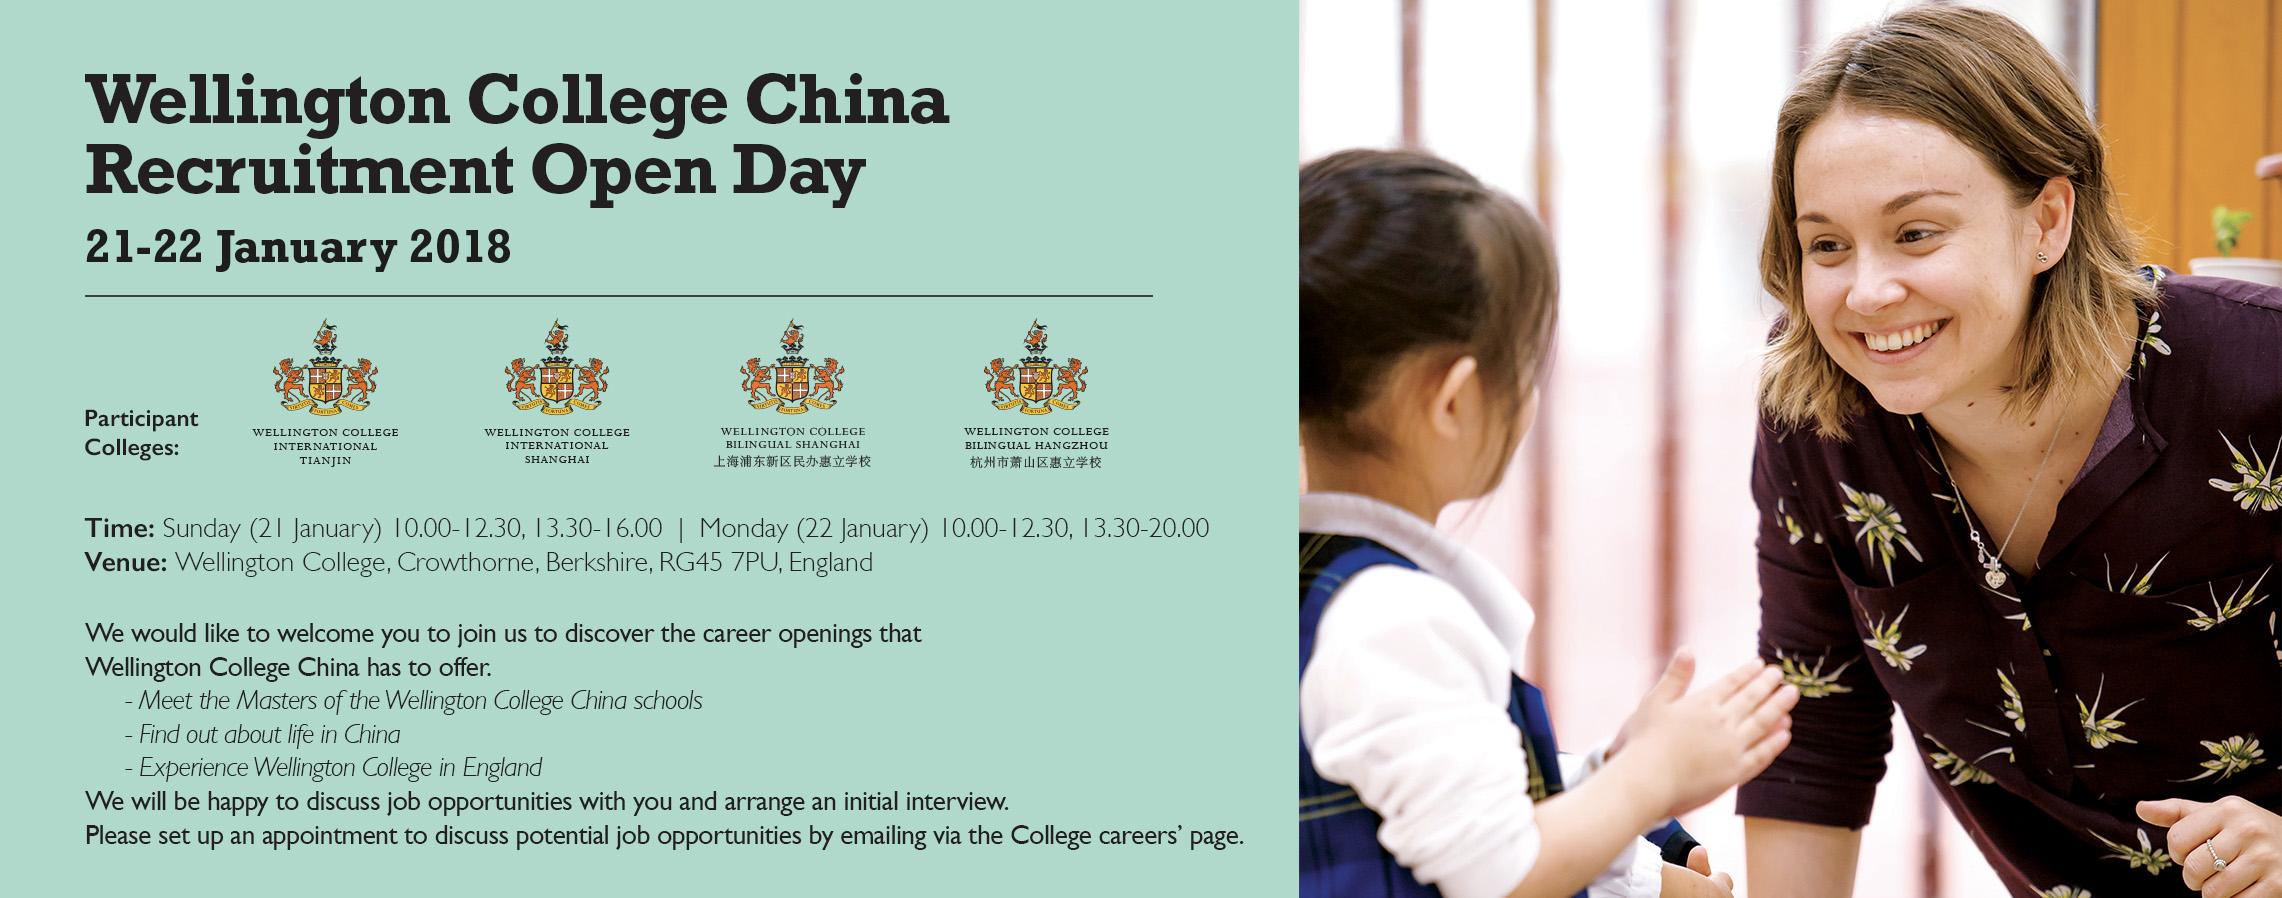 Wellington College China Recruitment Open Day